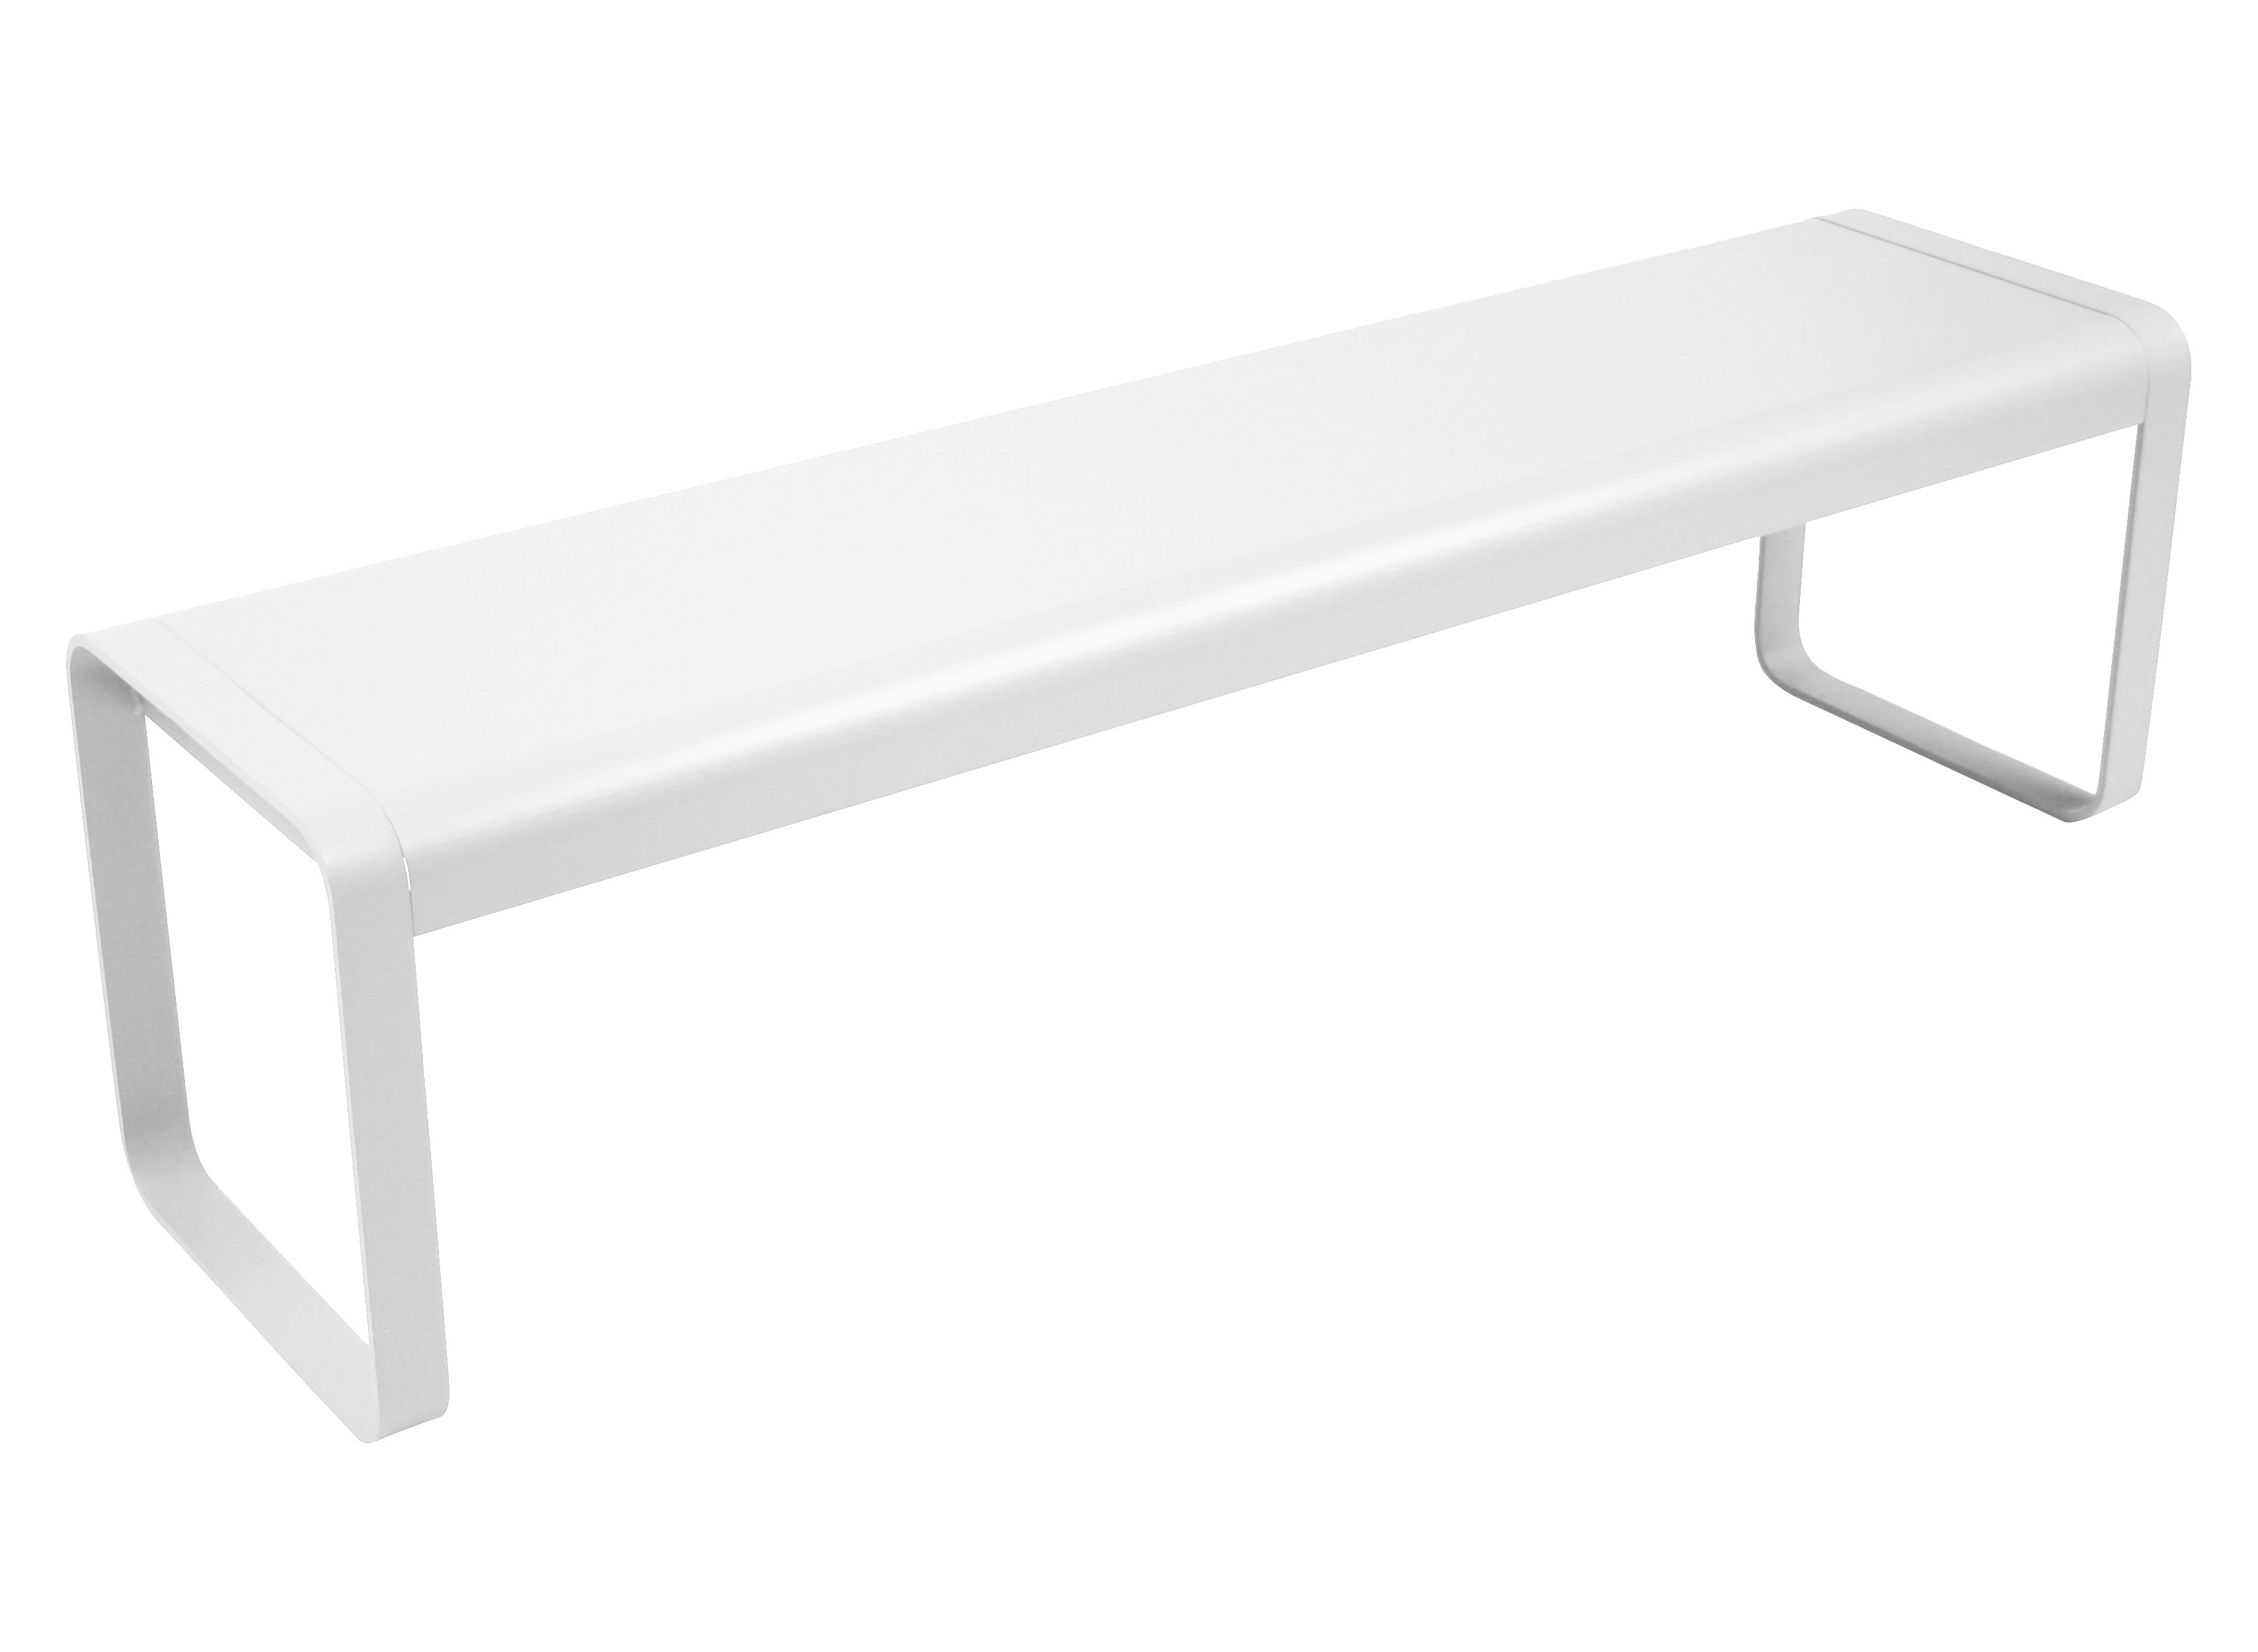 Arredamento - Panchine - Panchina Bellevie - L 161 cm - 4 posti di Fermob - Bianco - Acciaio, Alluminio